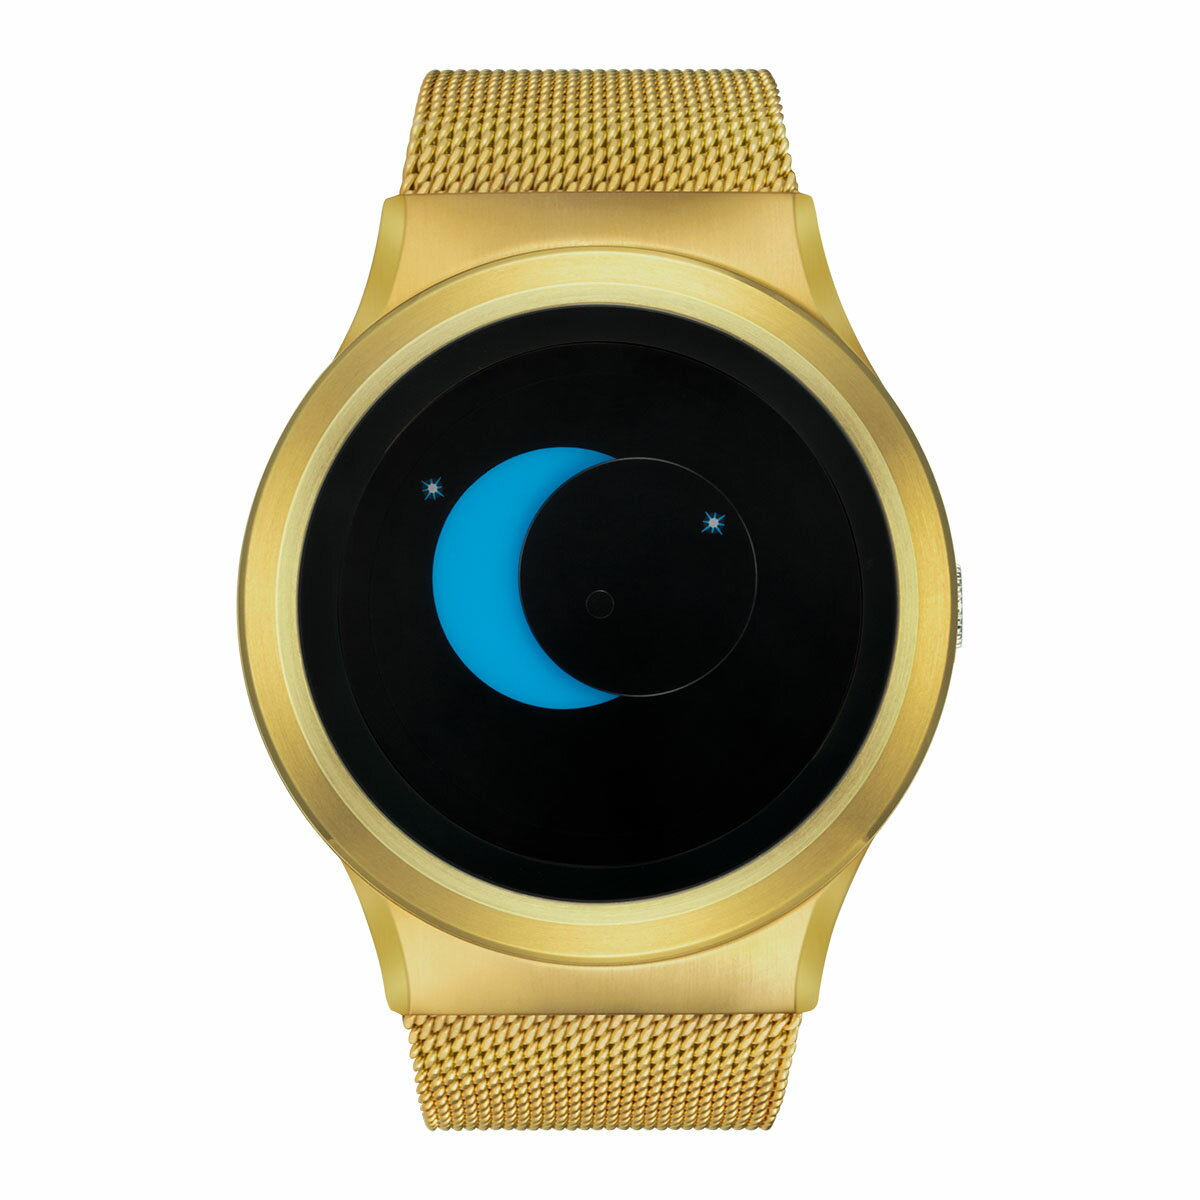 ZEROO SUPER MOON ゼロ 電池式クォーツ 腕時計 [W02006B04SM04] ブルー デザインウォッチ ペア用 メンズ レディース ユニセックス おしゃれ時計 デザイナーズ